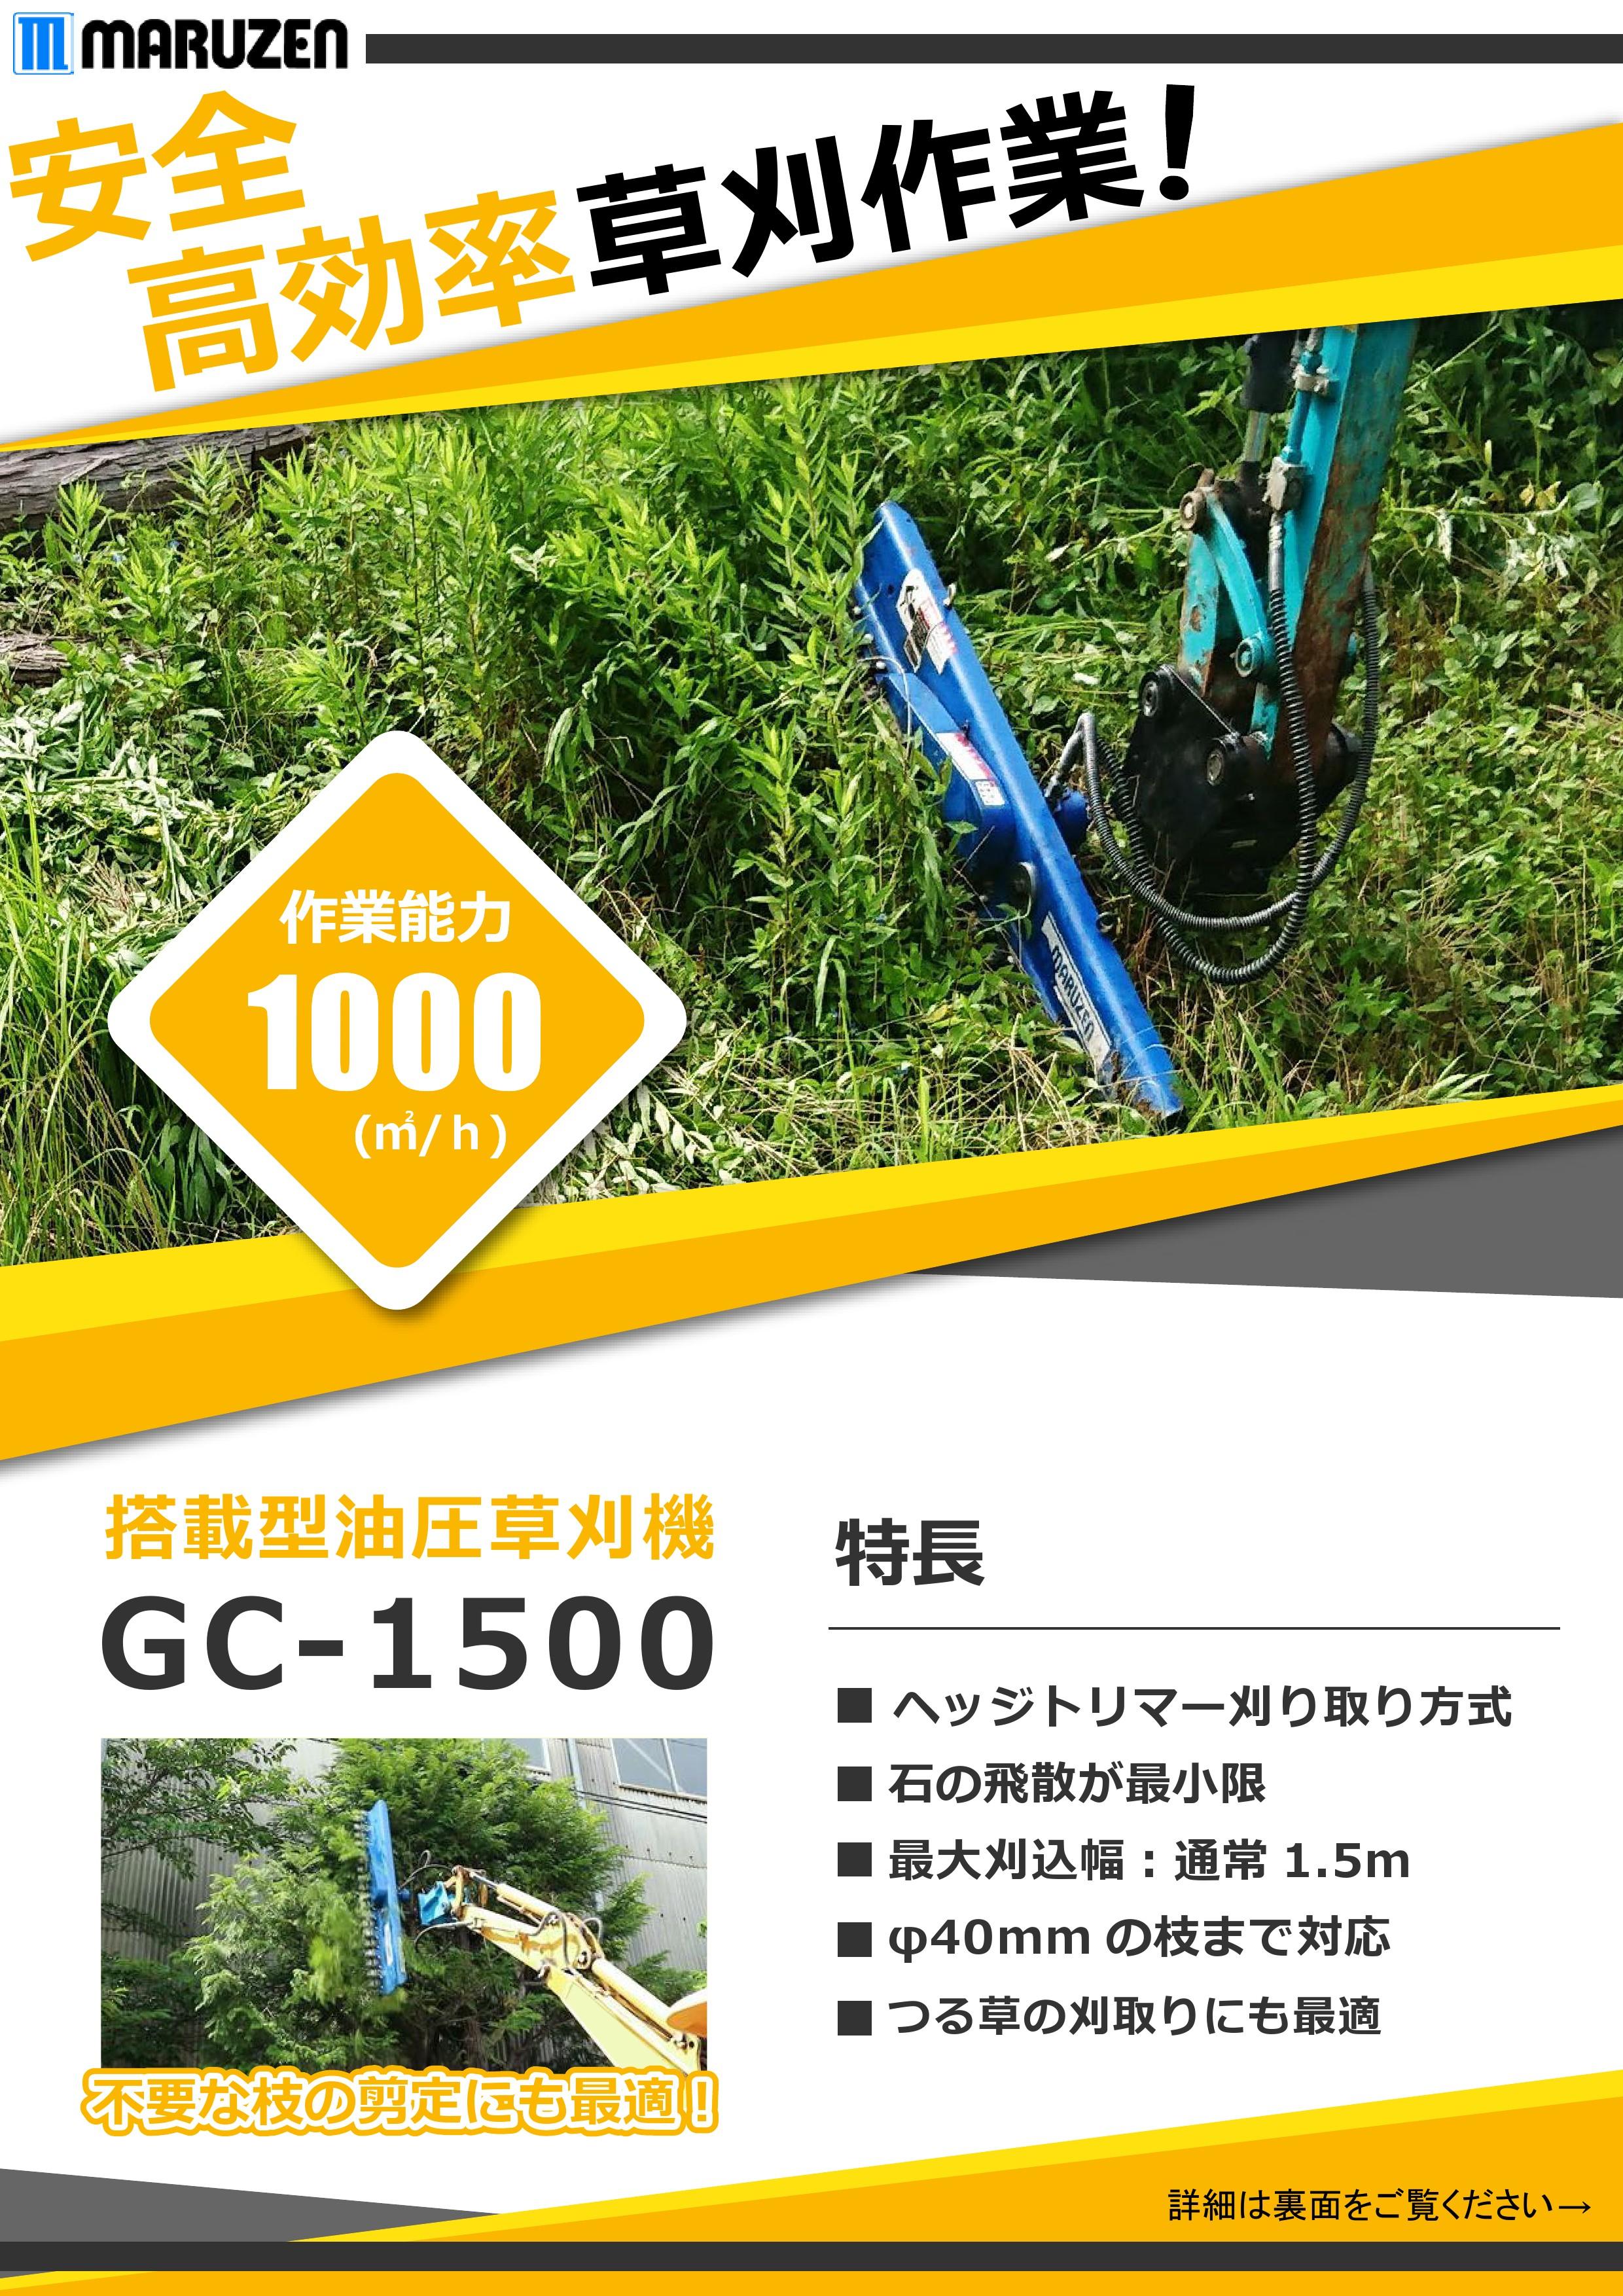 GC-1500